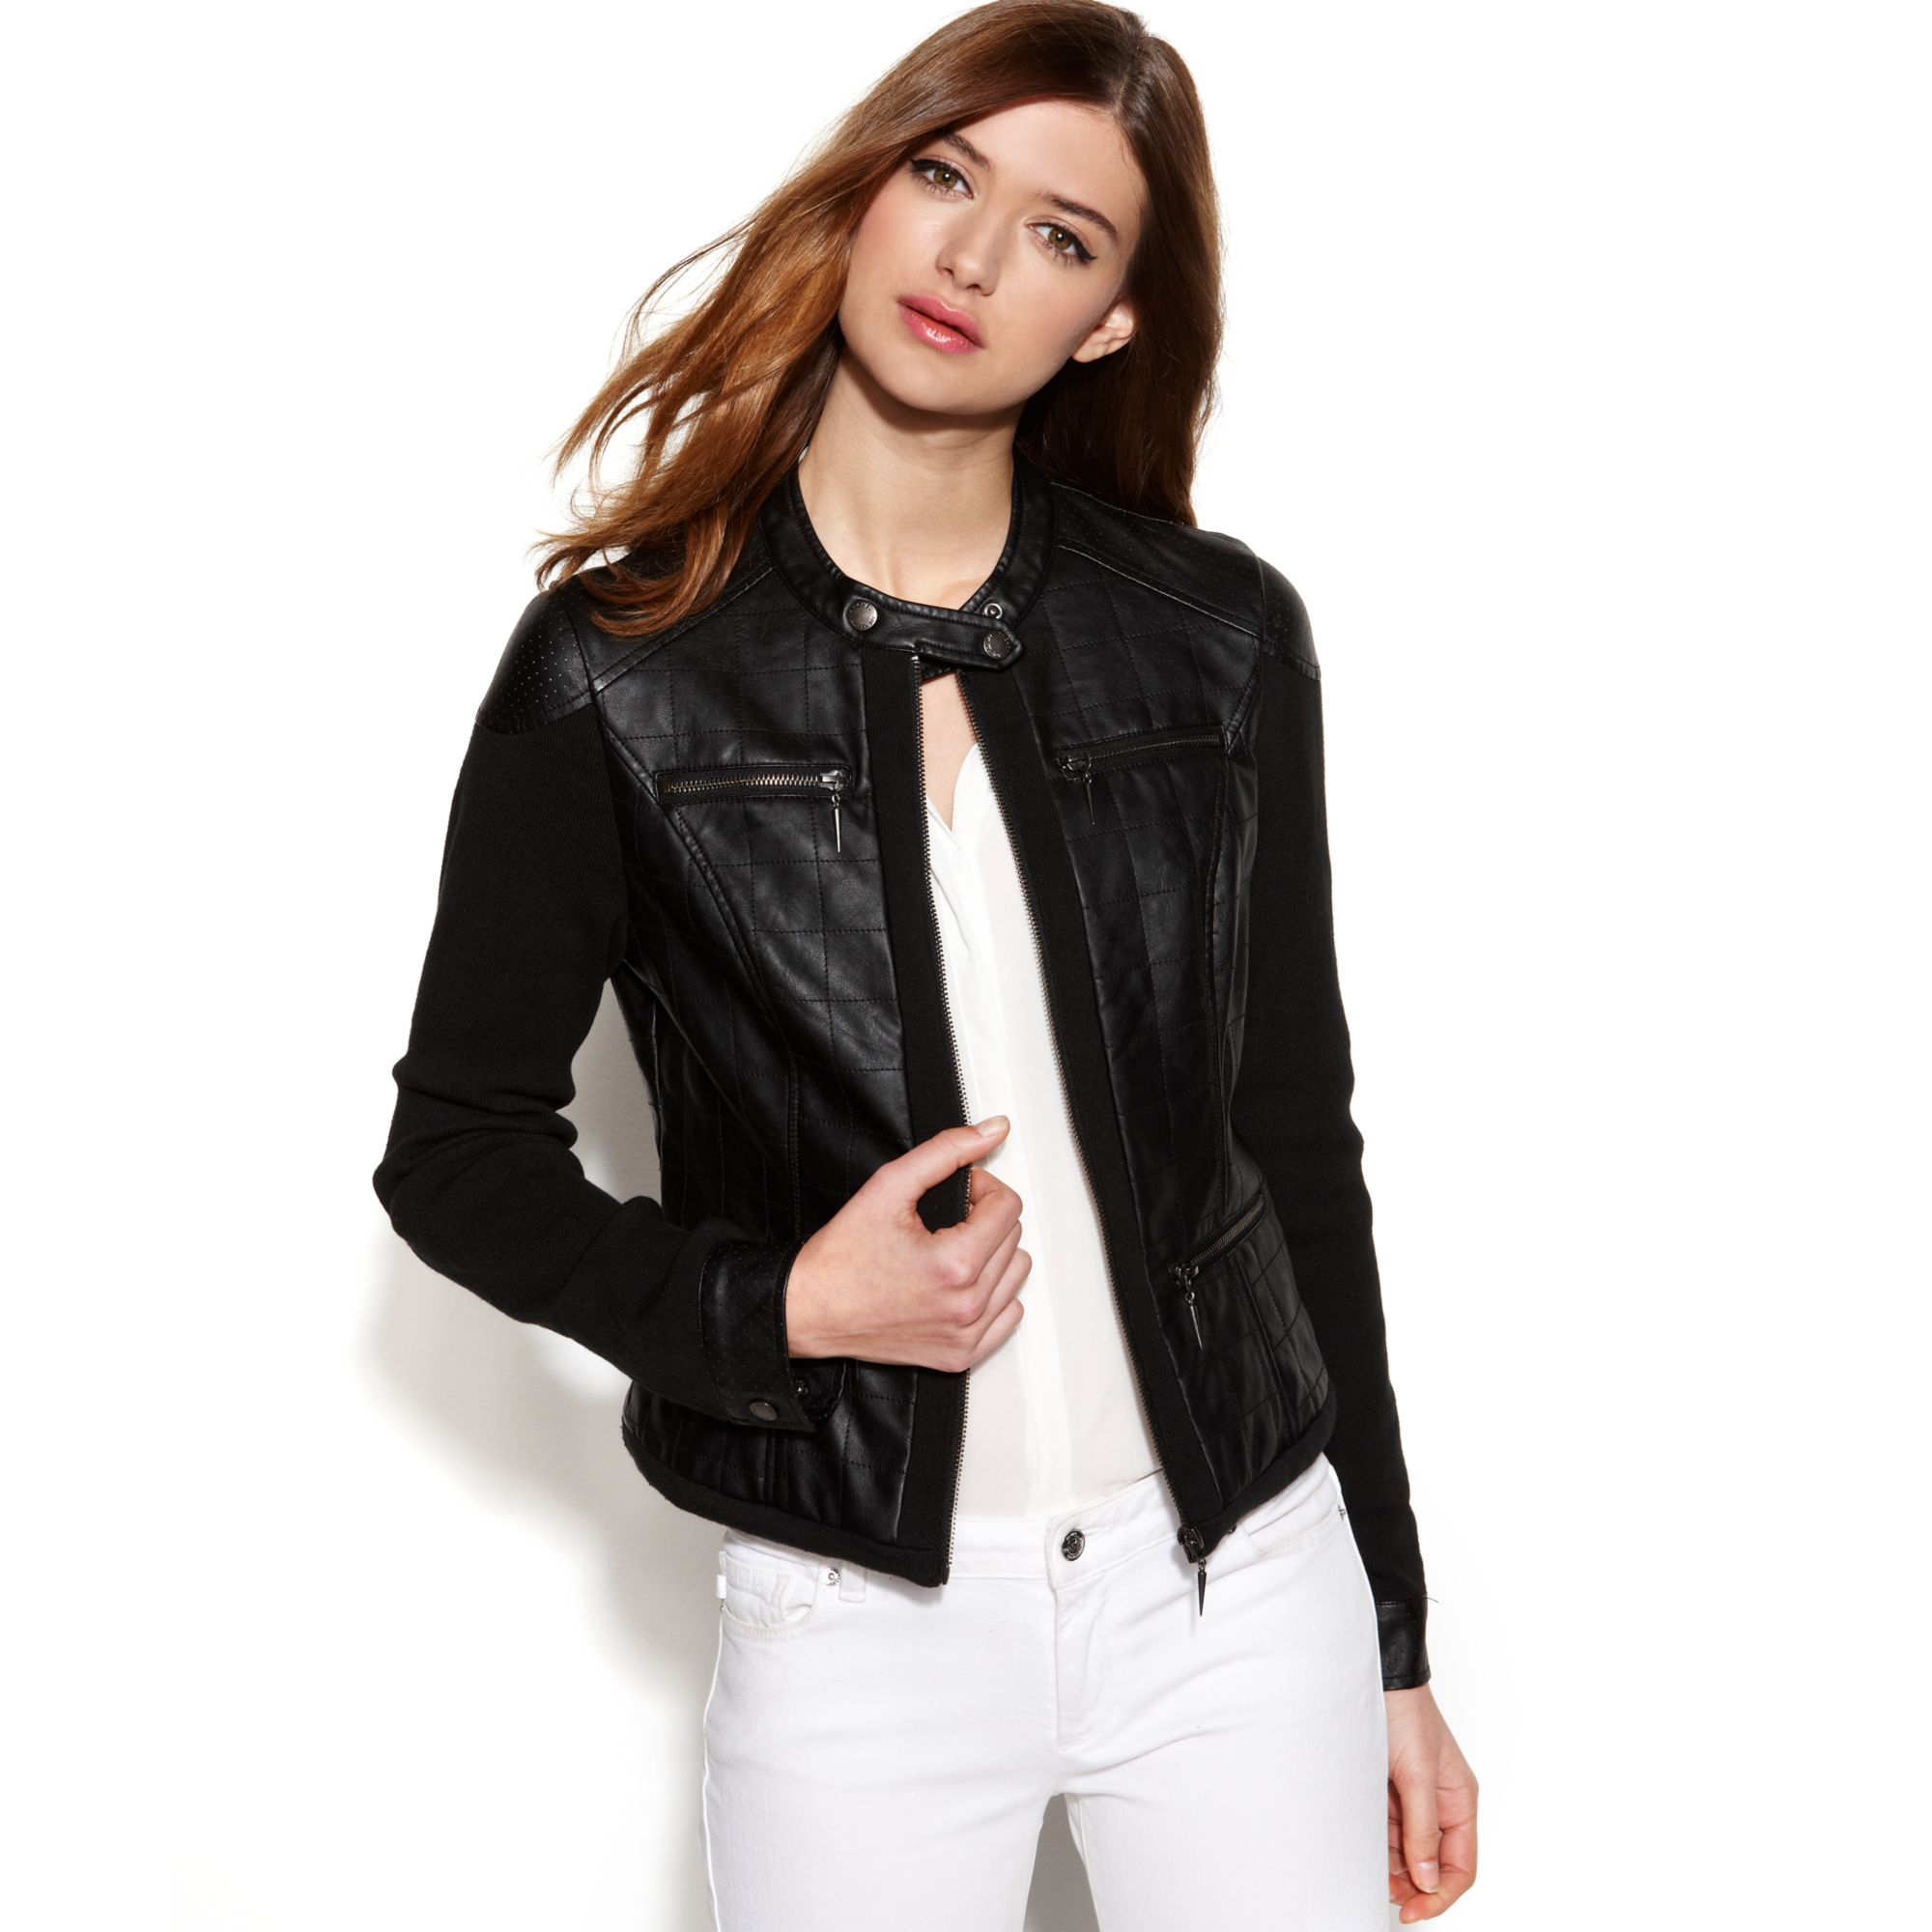 ad396e97ed9 RACHEL Rachel Roy Quilted Mixedmedia Fauxleather Jacket in Black - Lyst